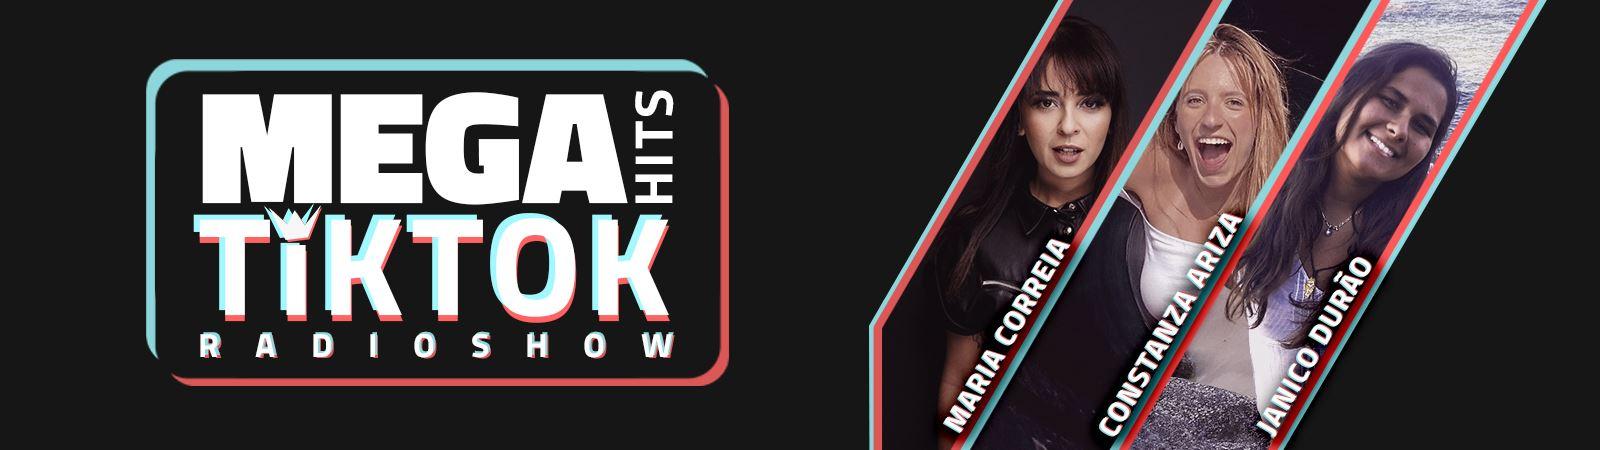 Mega Hits TikTok Radioshow